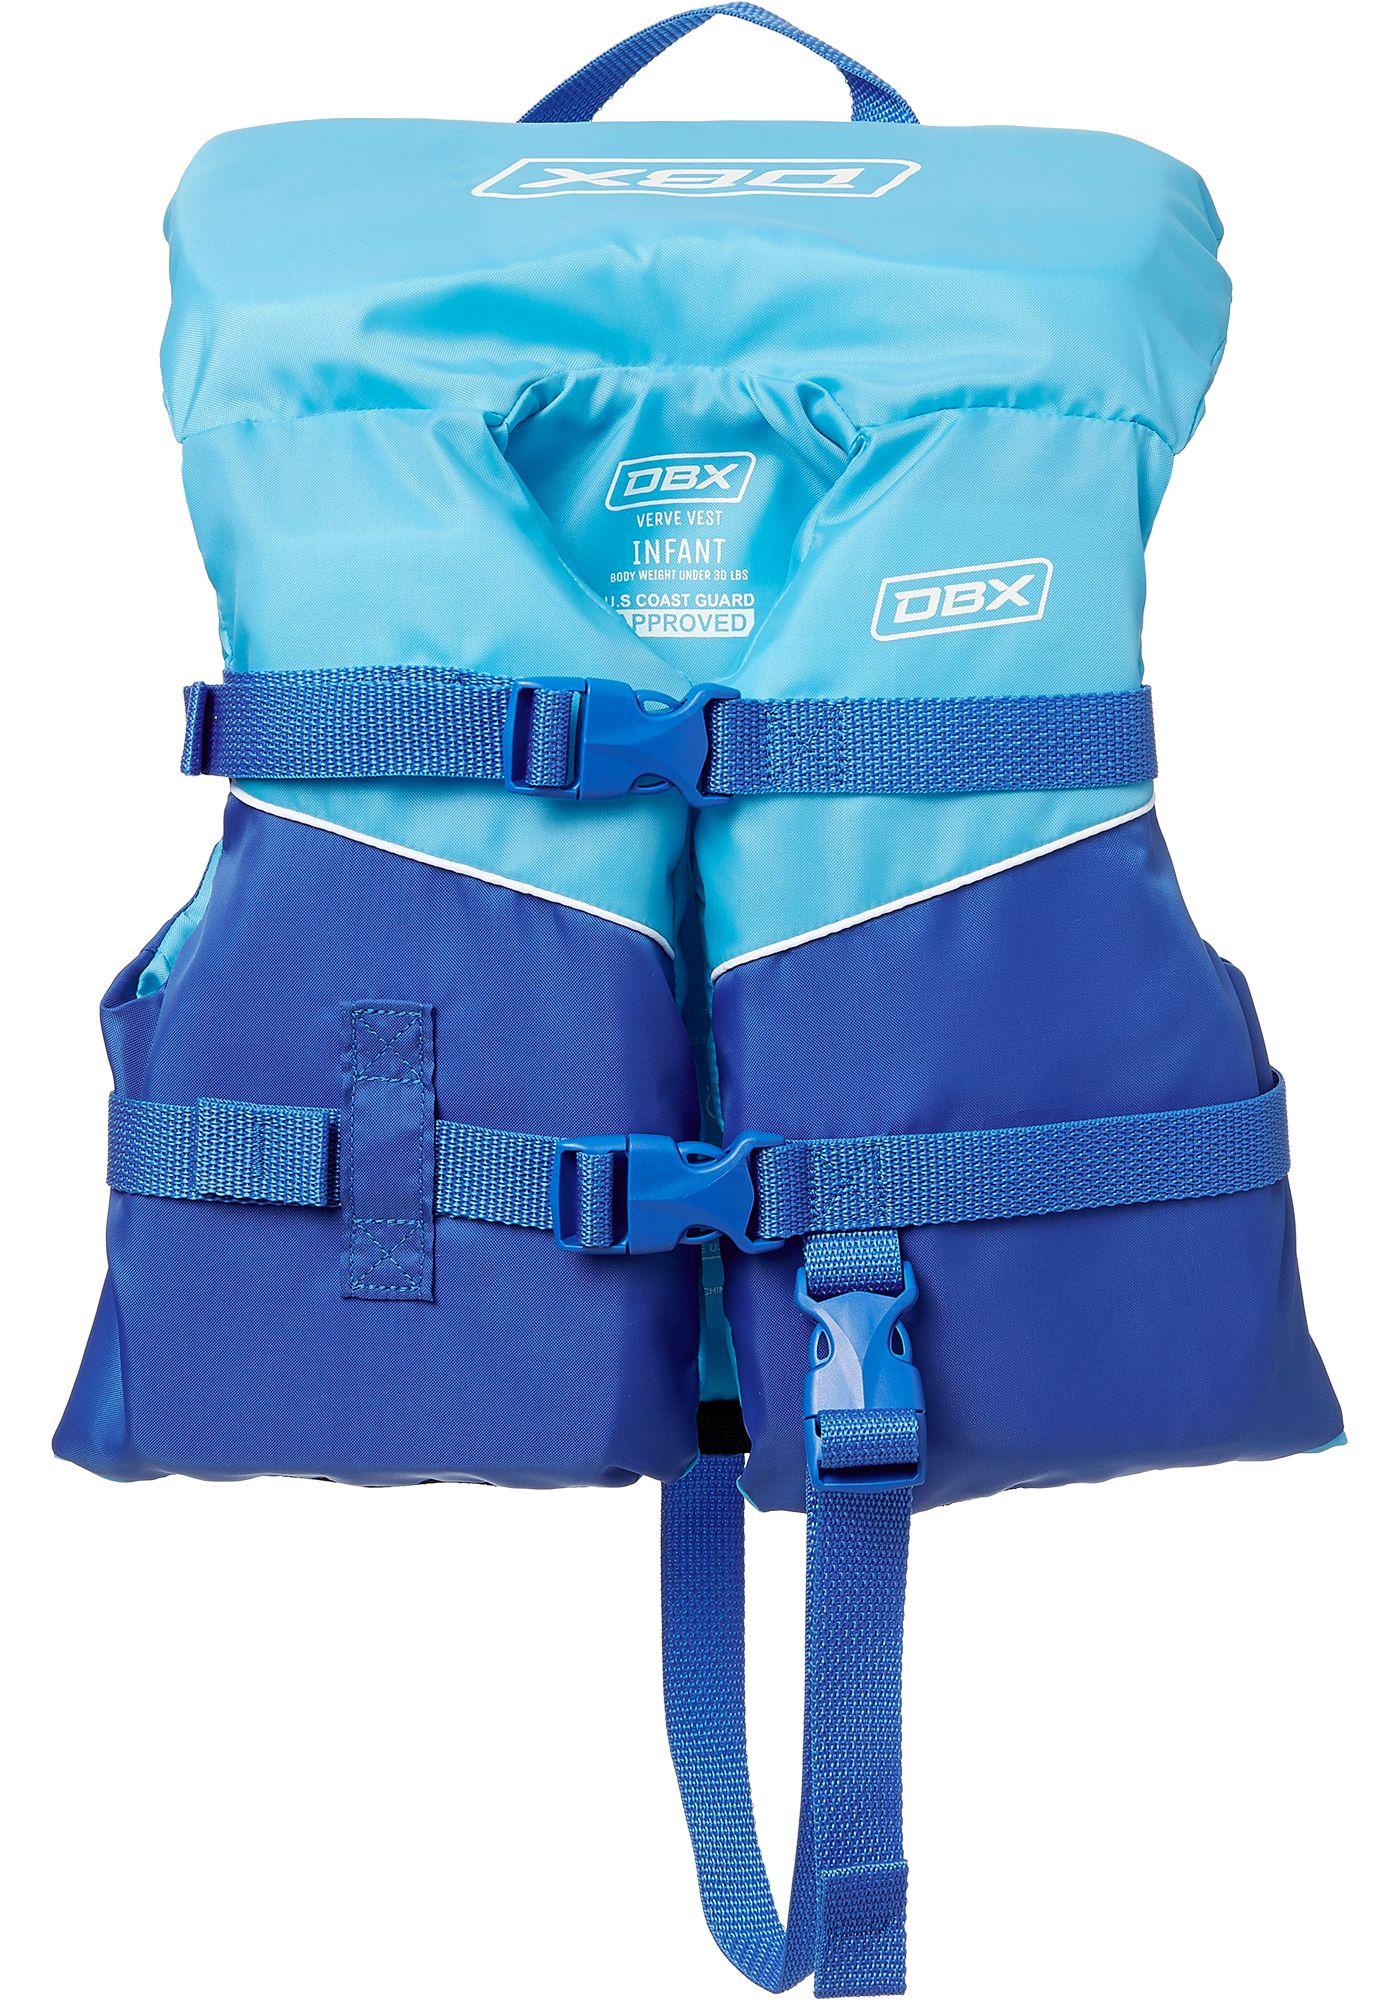 DBX Infant Verve Nylon Life Vest